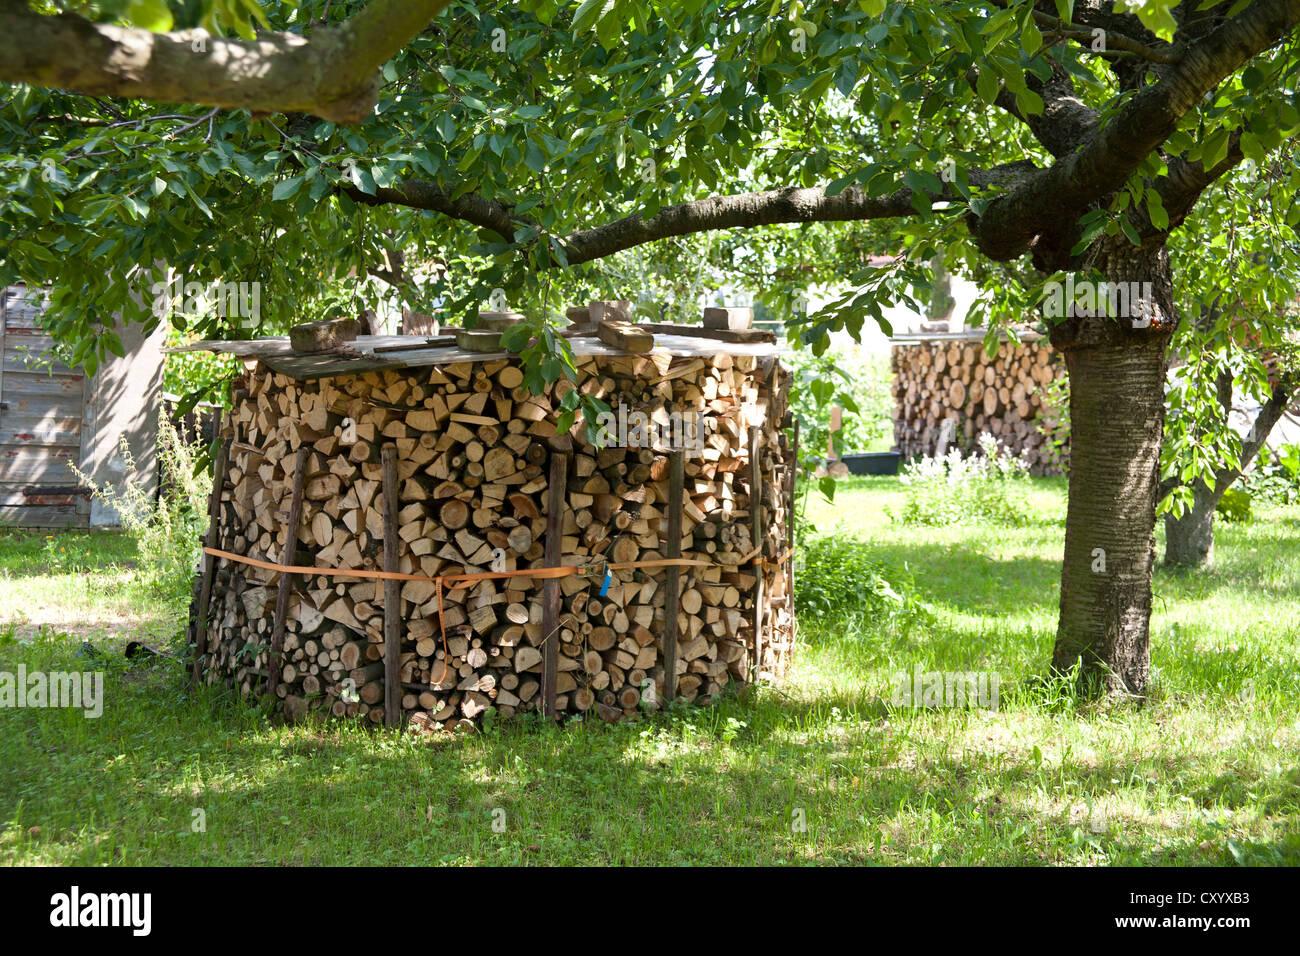 holz stapeln im garten brennholz versorgung f r einen kamin stockfoto bild 51015191 alamy. Black Bedroom Furniture Sets. Home Design Ideas